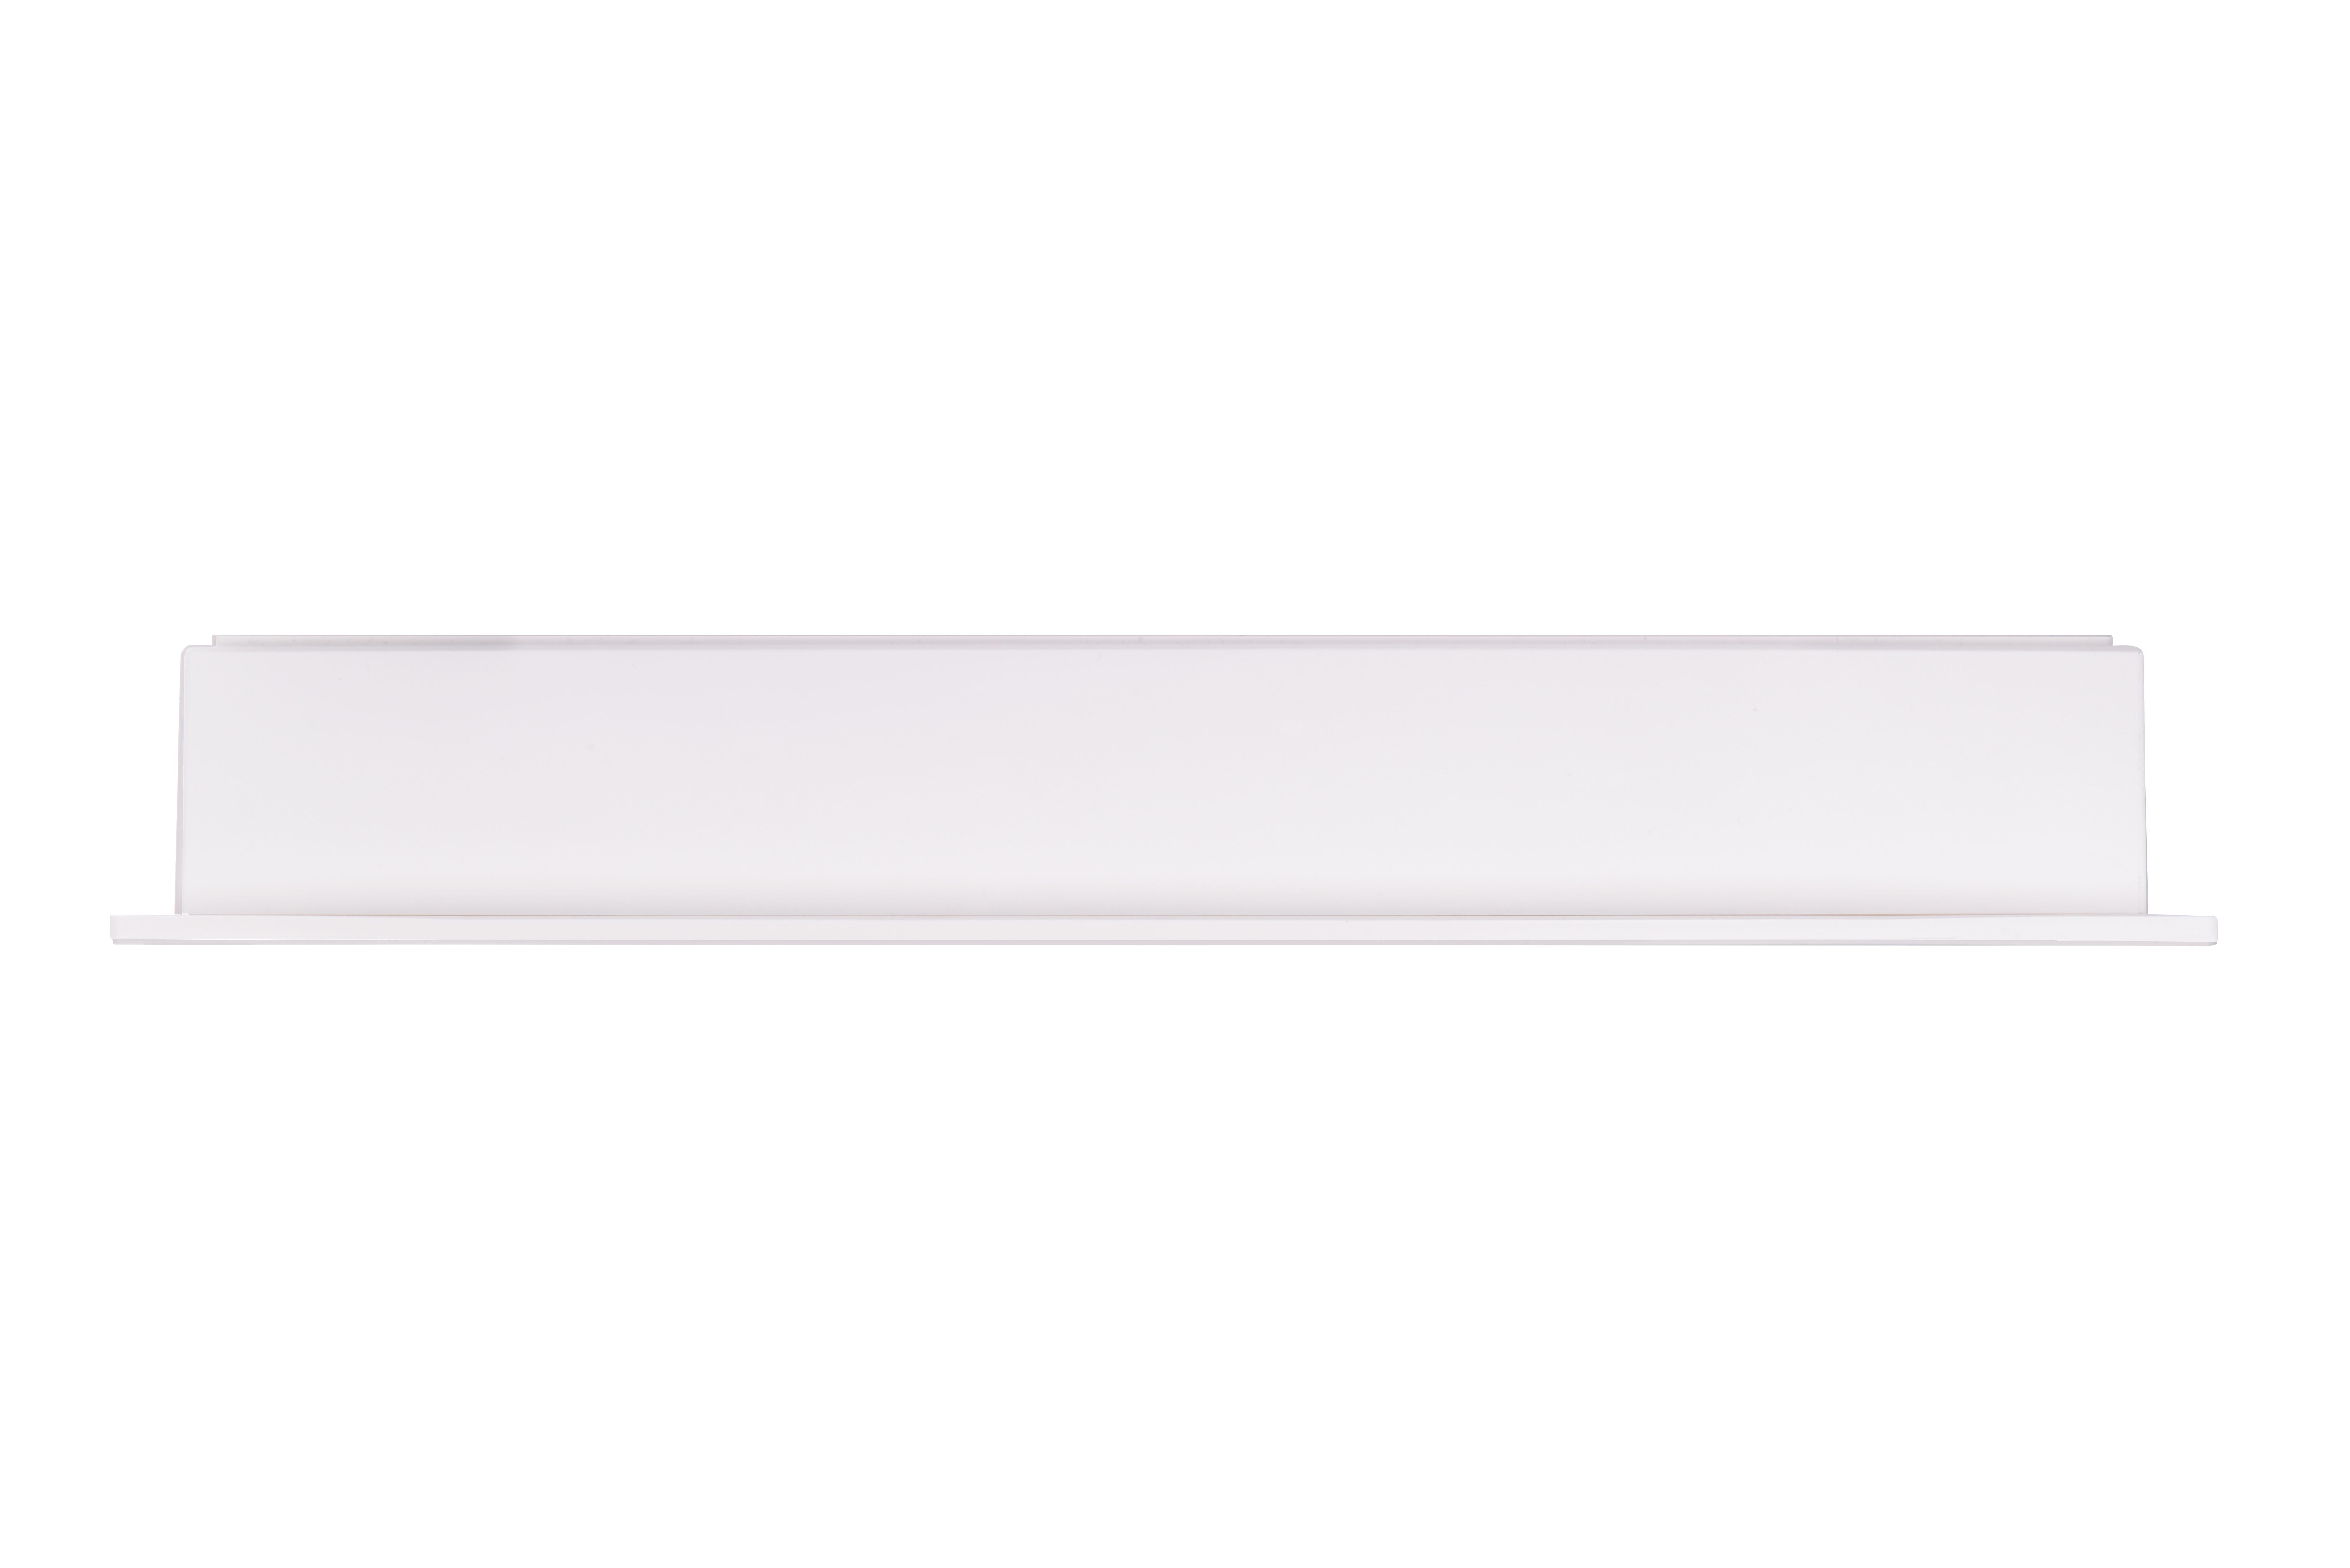 Lampa emergenta led Intelight 94658   3h mentinut test automat5